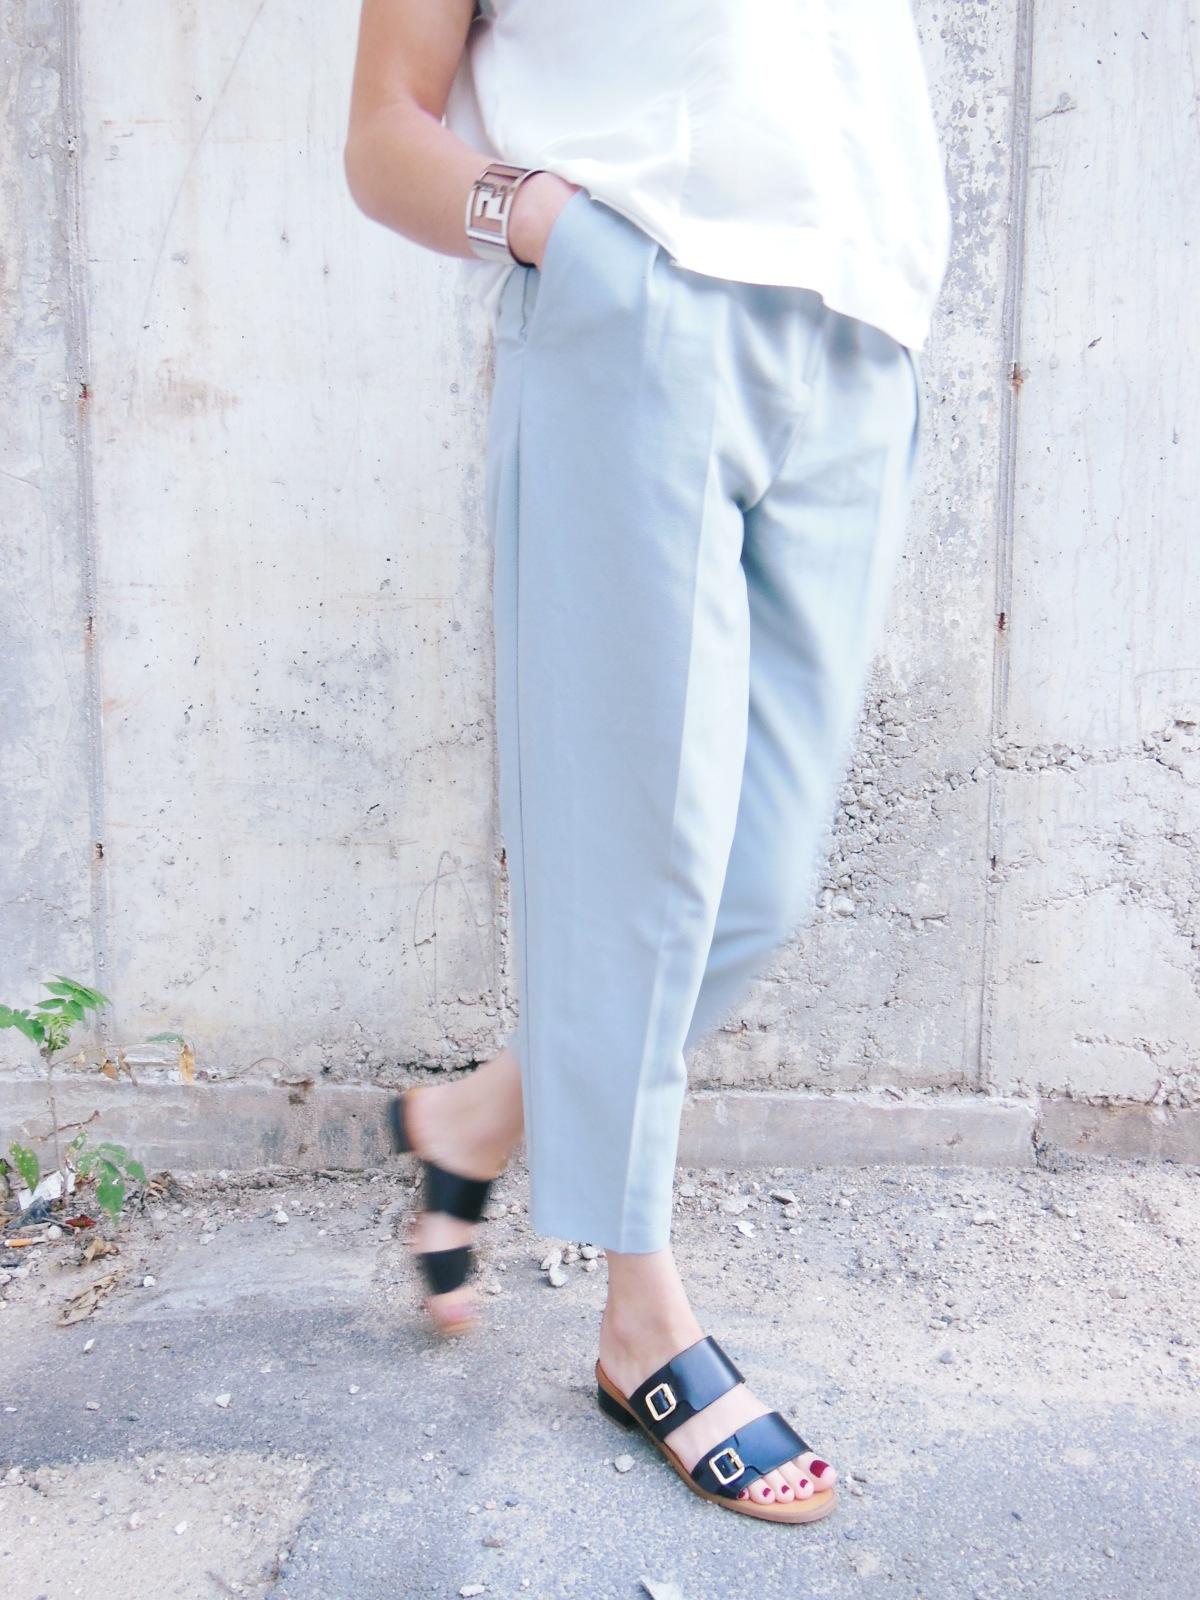 2 - HW Pants - Pro 2